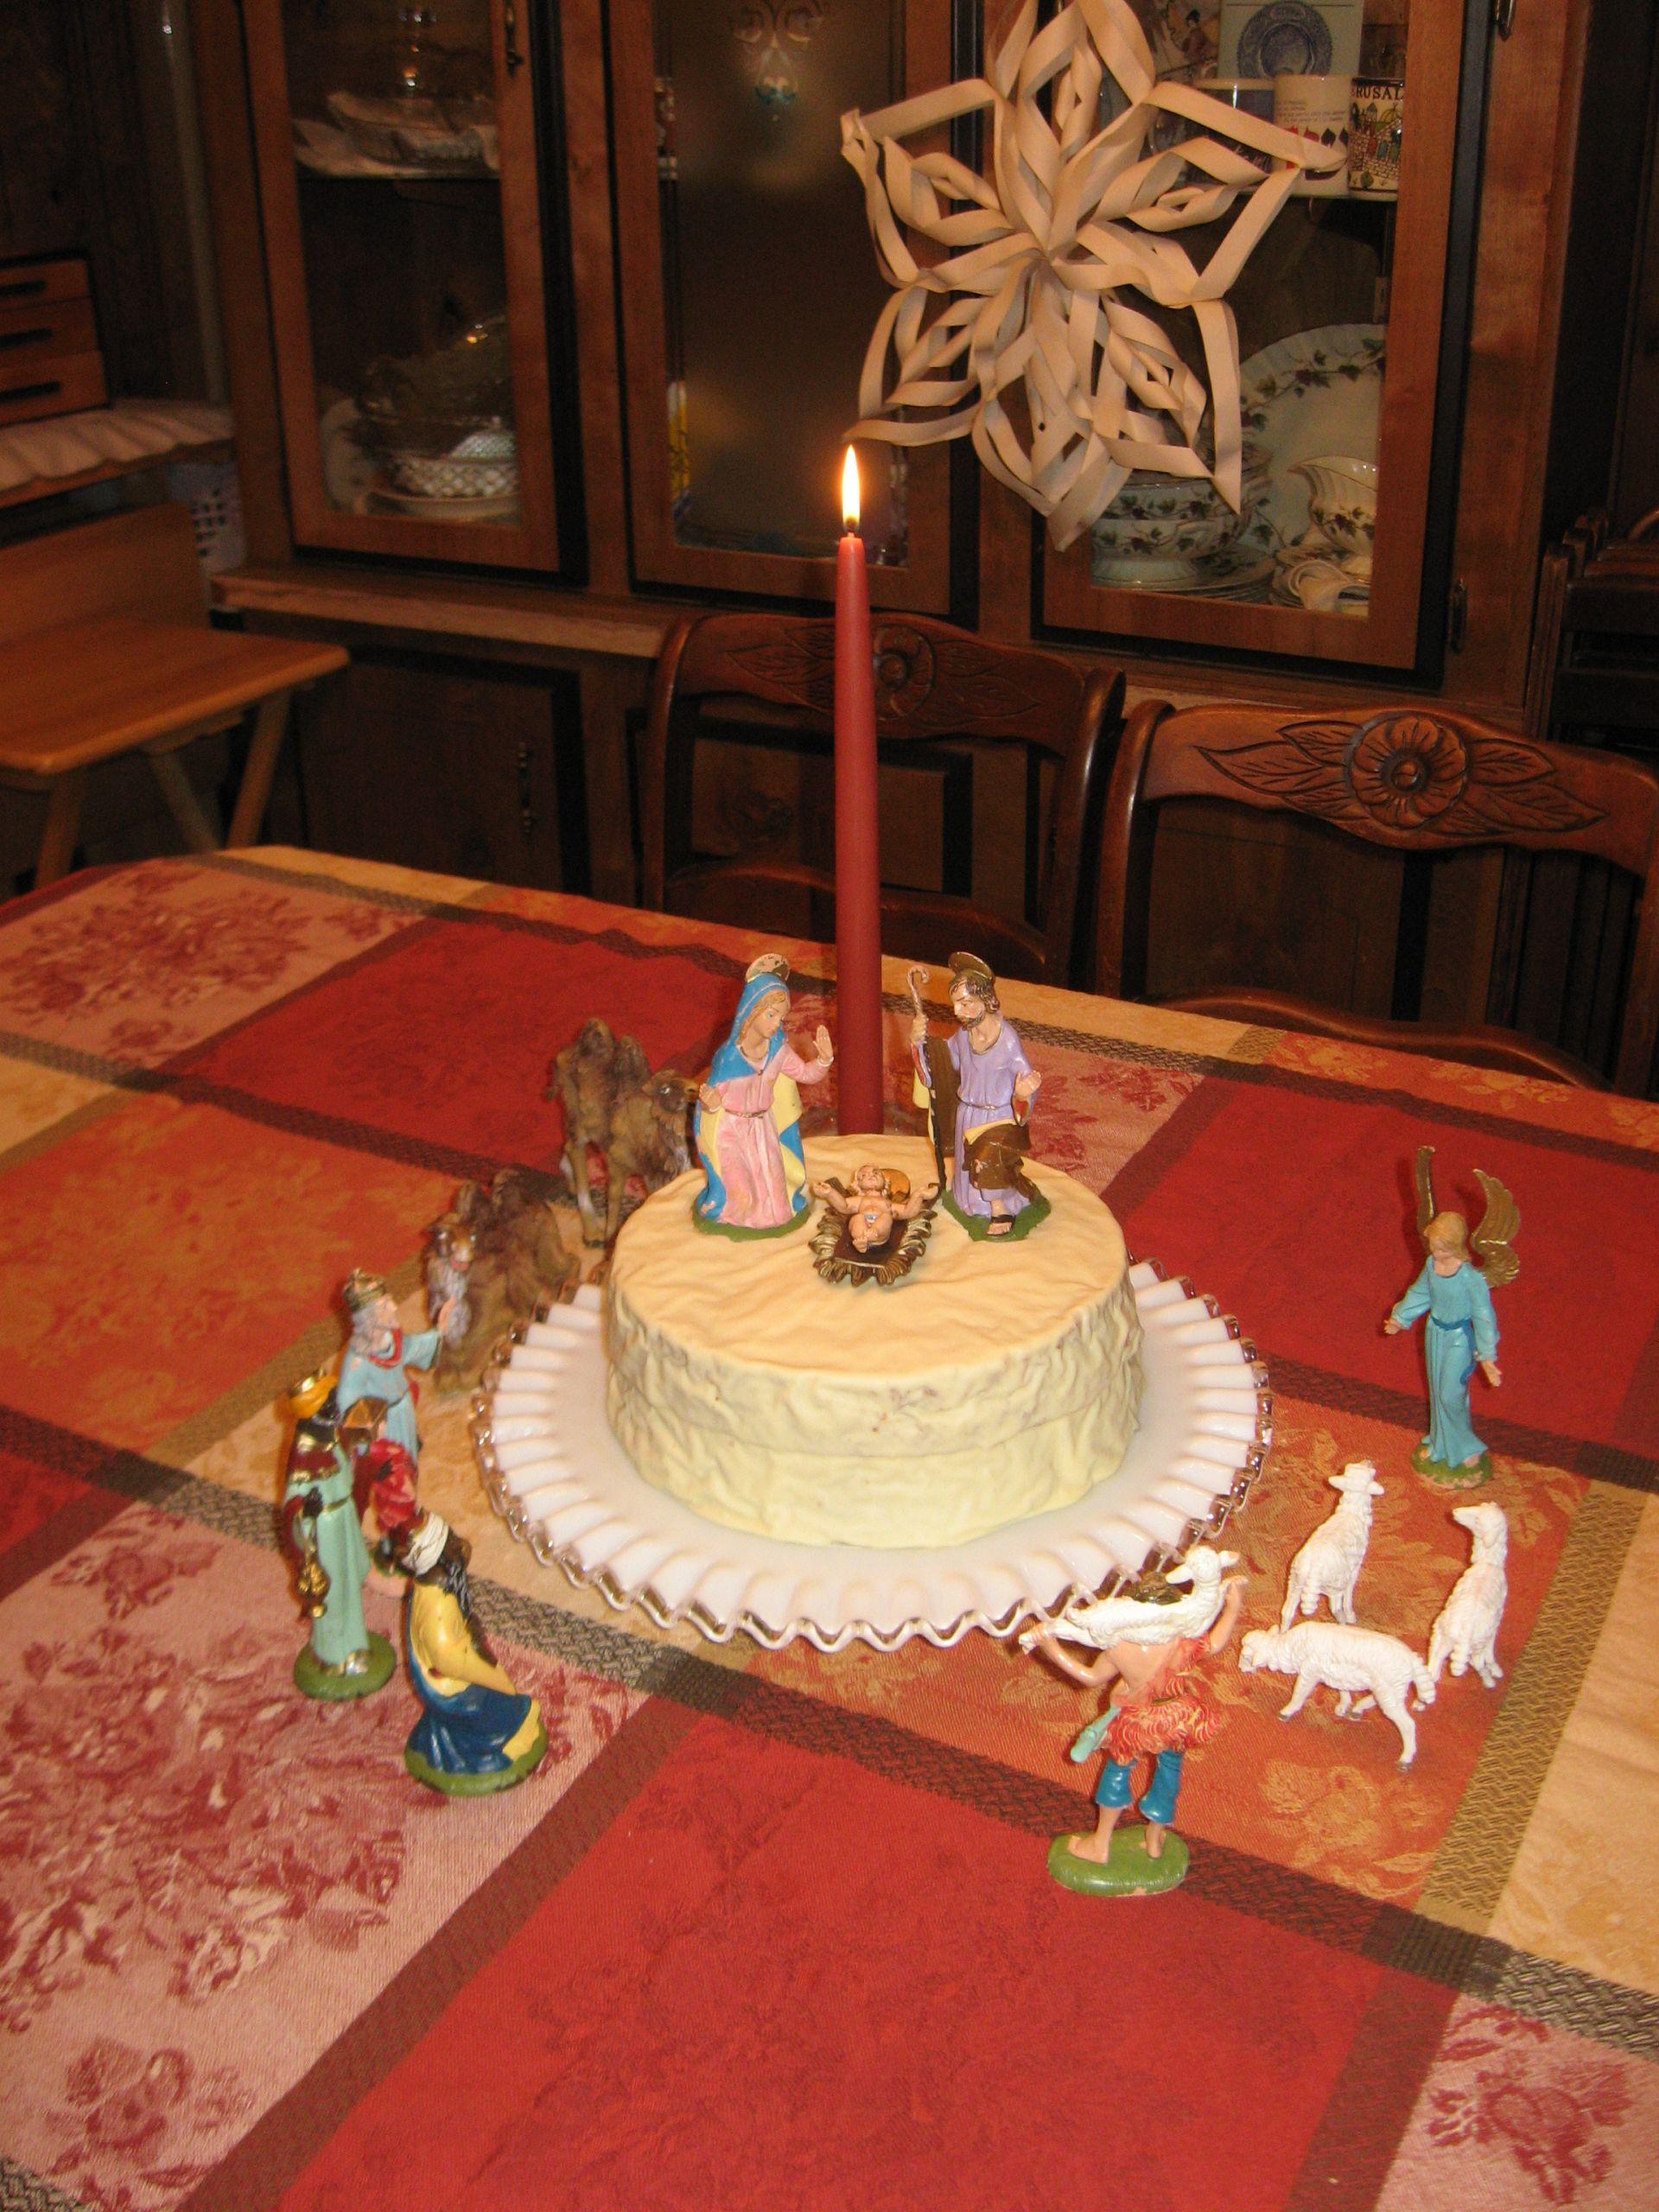 Birthday Cake For Jesus  Home for the Holidays – Baby Jesus Birthday Cake